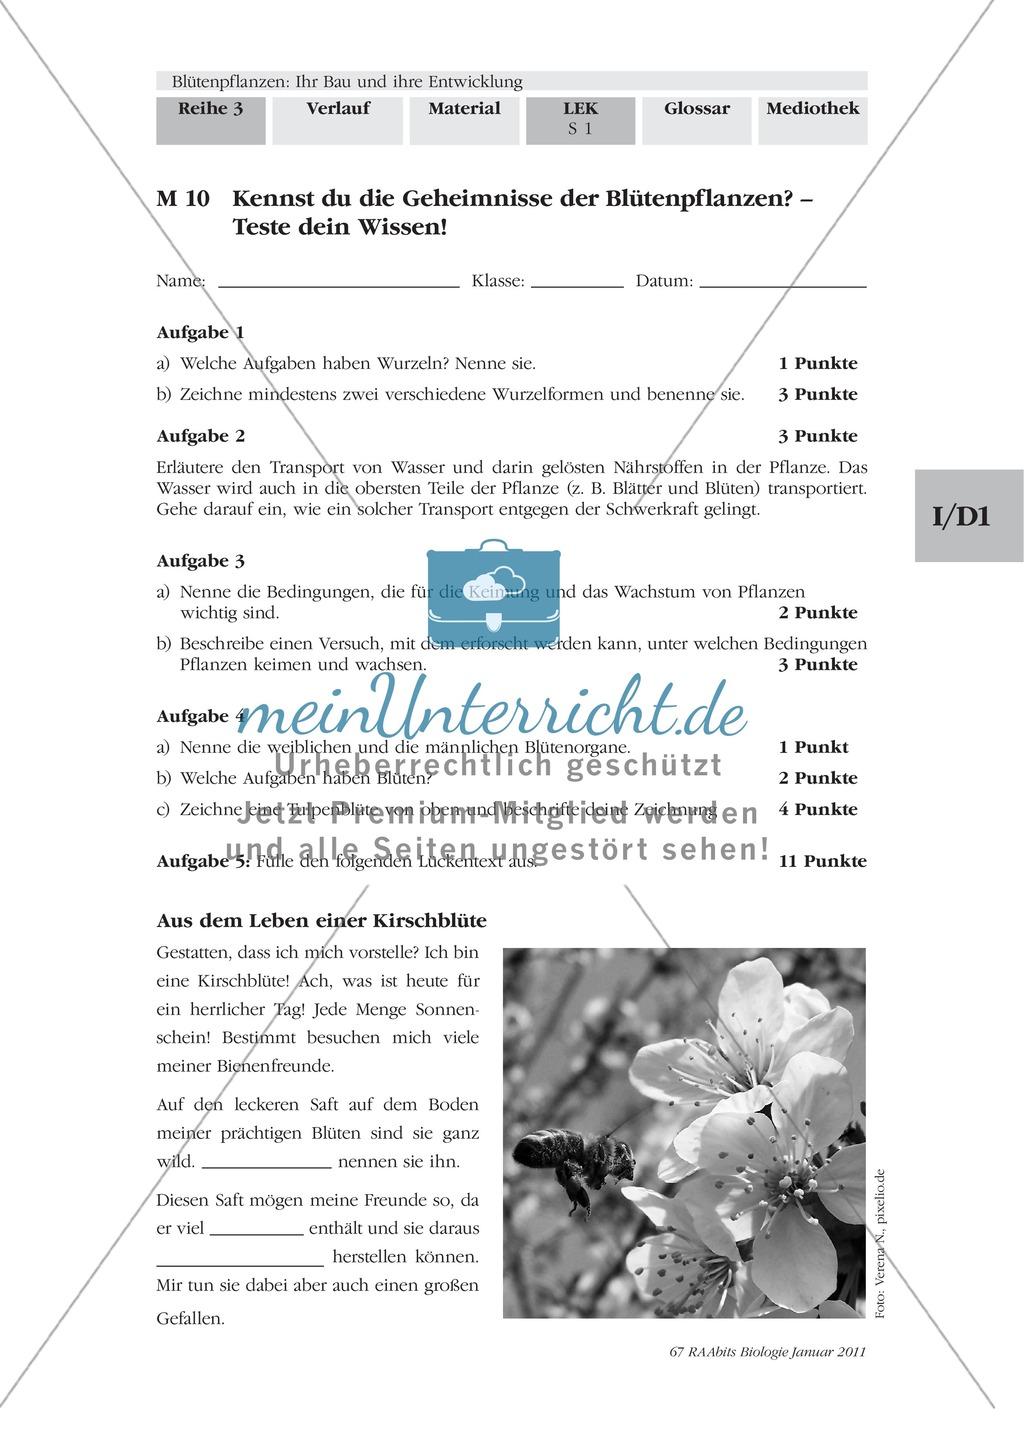 LEK Blütenpflanzen: Lückentext, Zeichnen Preview 0